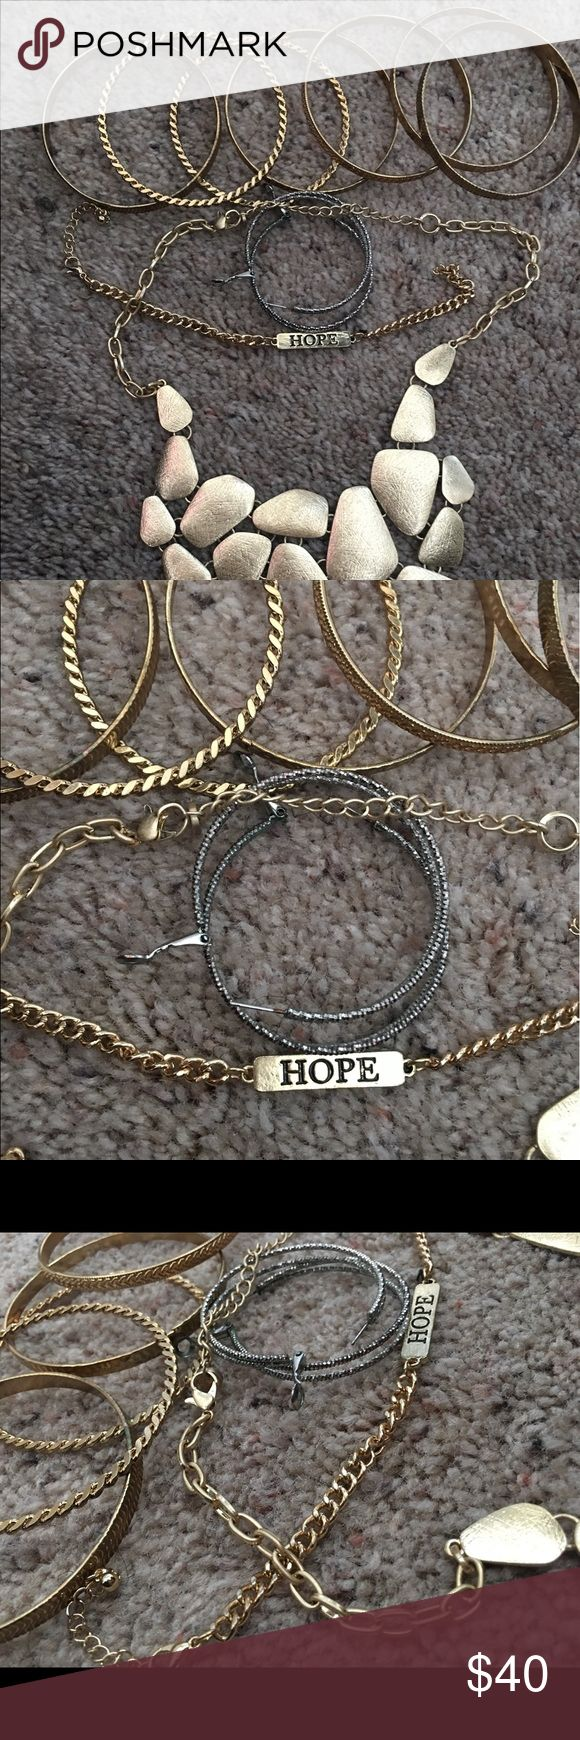 Jewelry set Bangle bracelet set, silver hoop earring, hope bracelet, chunky gold necklace Accessories